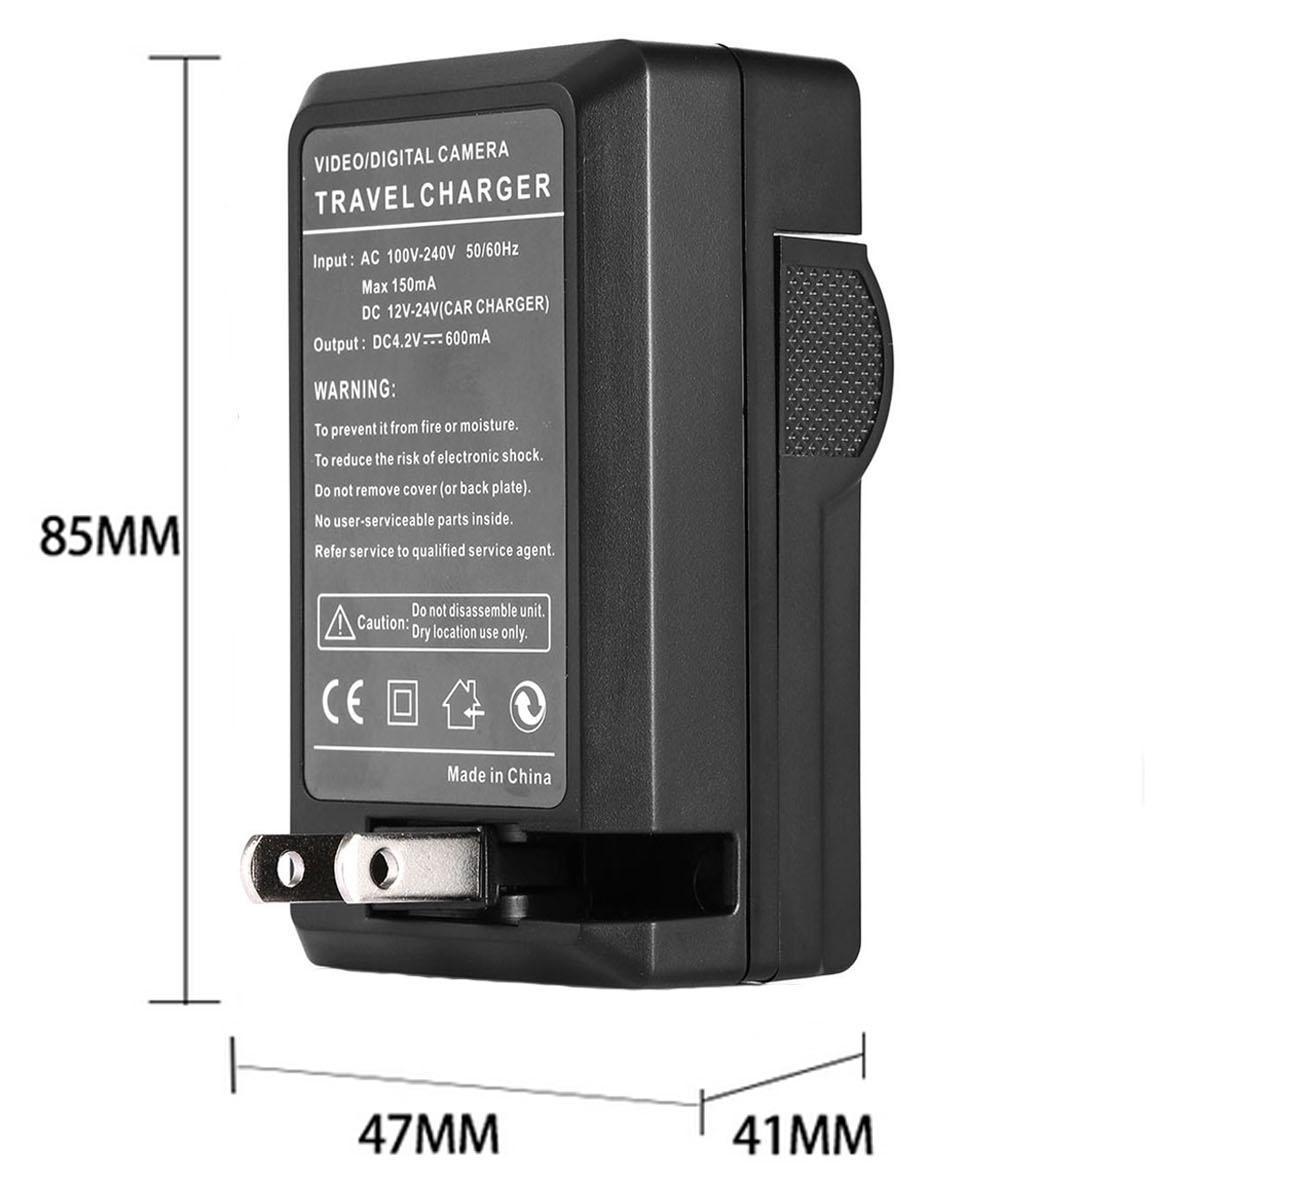 HDR-SR11E HDR-SR12E Handycam Camcorder LCD USB Travel Battery Charger for Sony HDR-SR10E